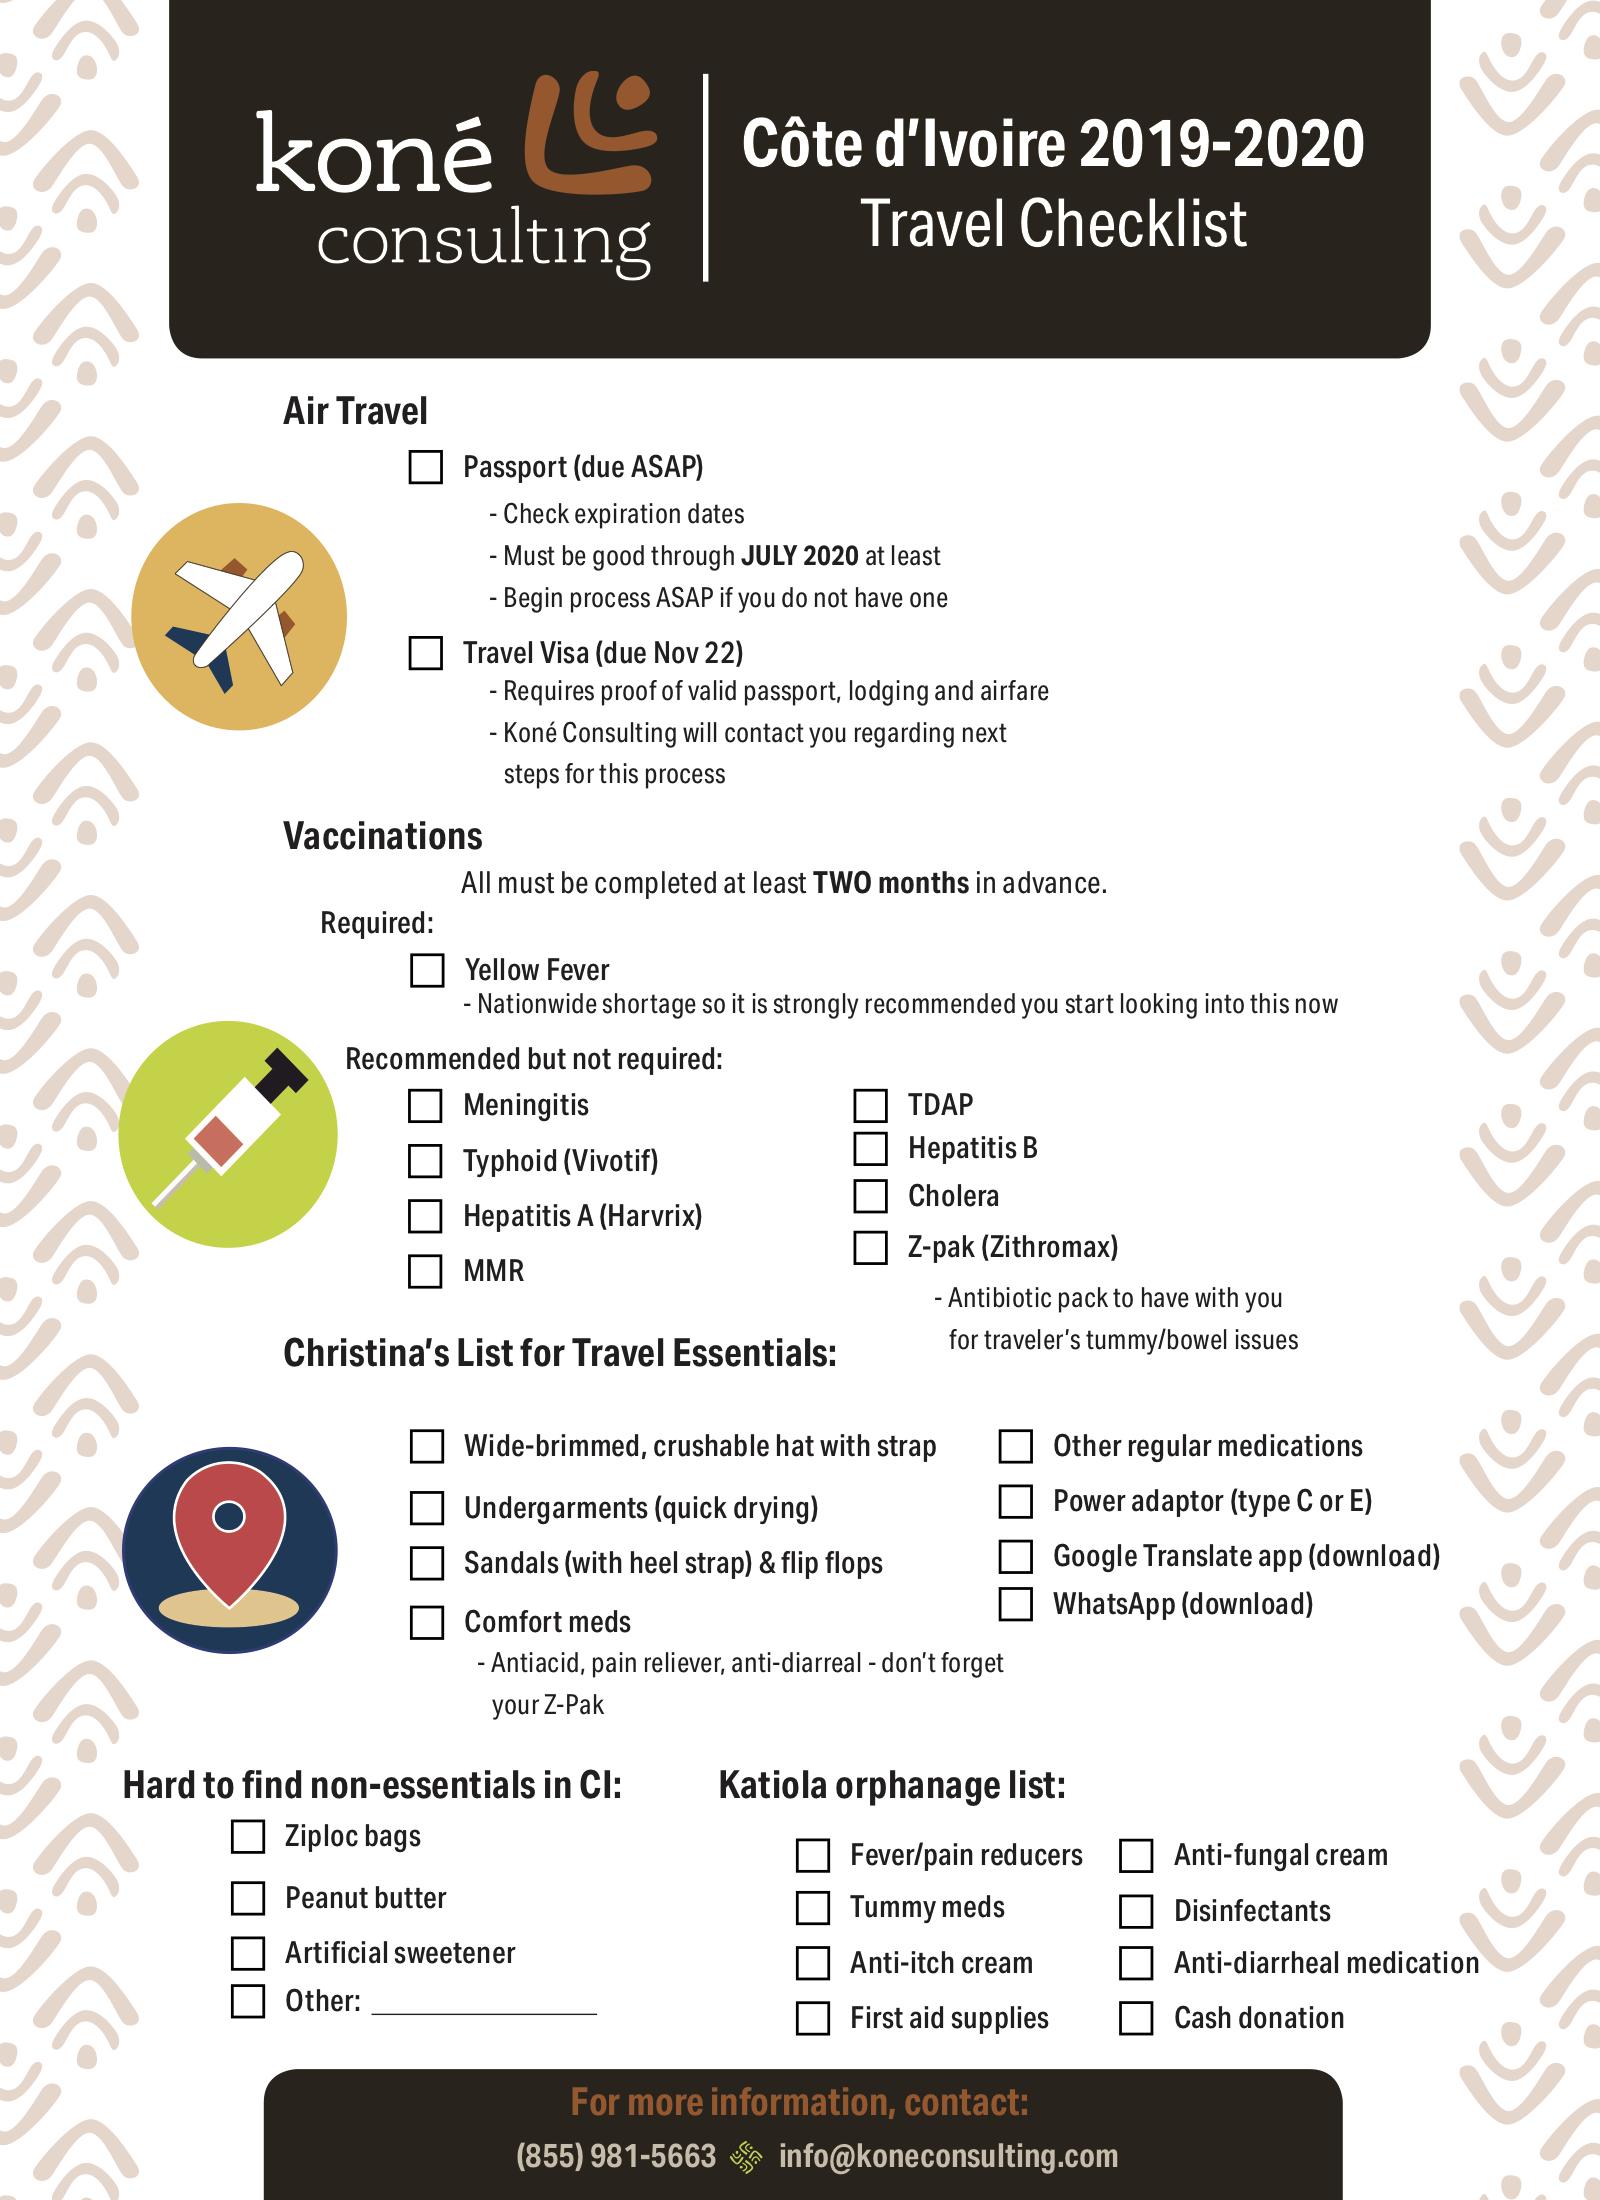 CI checklist 08.02.19 JPEG.jpg